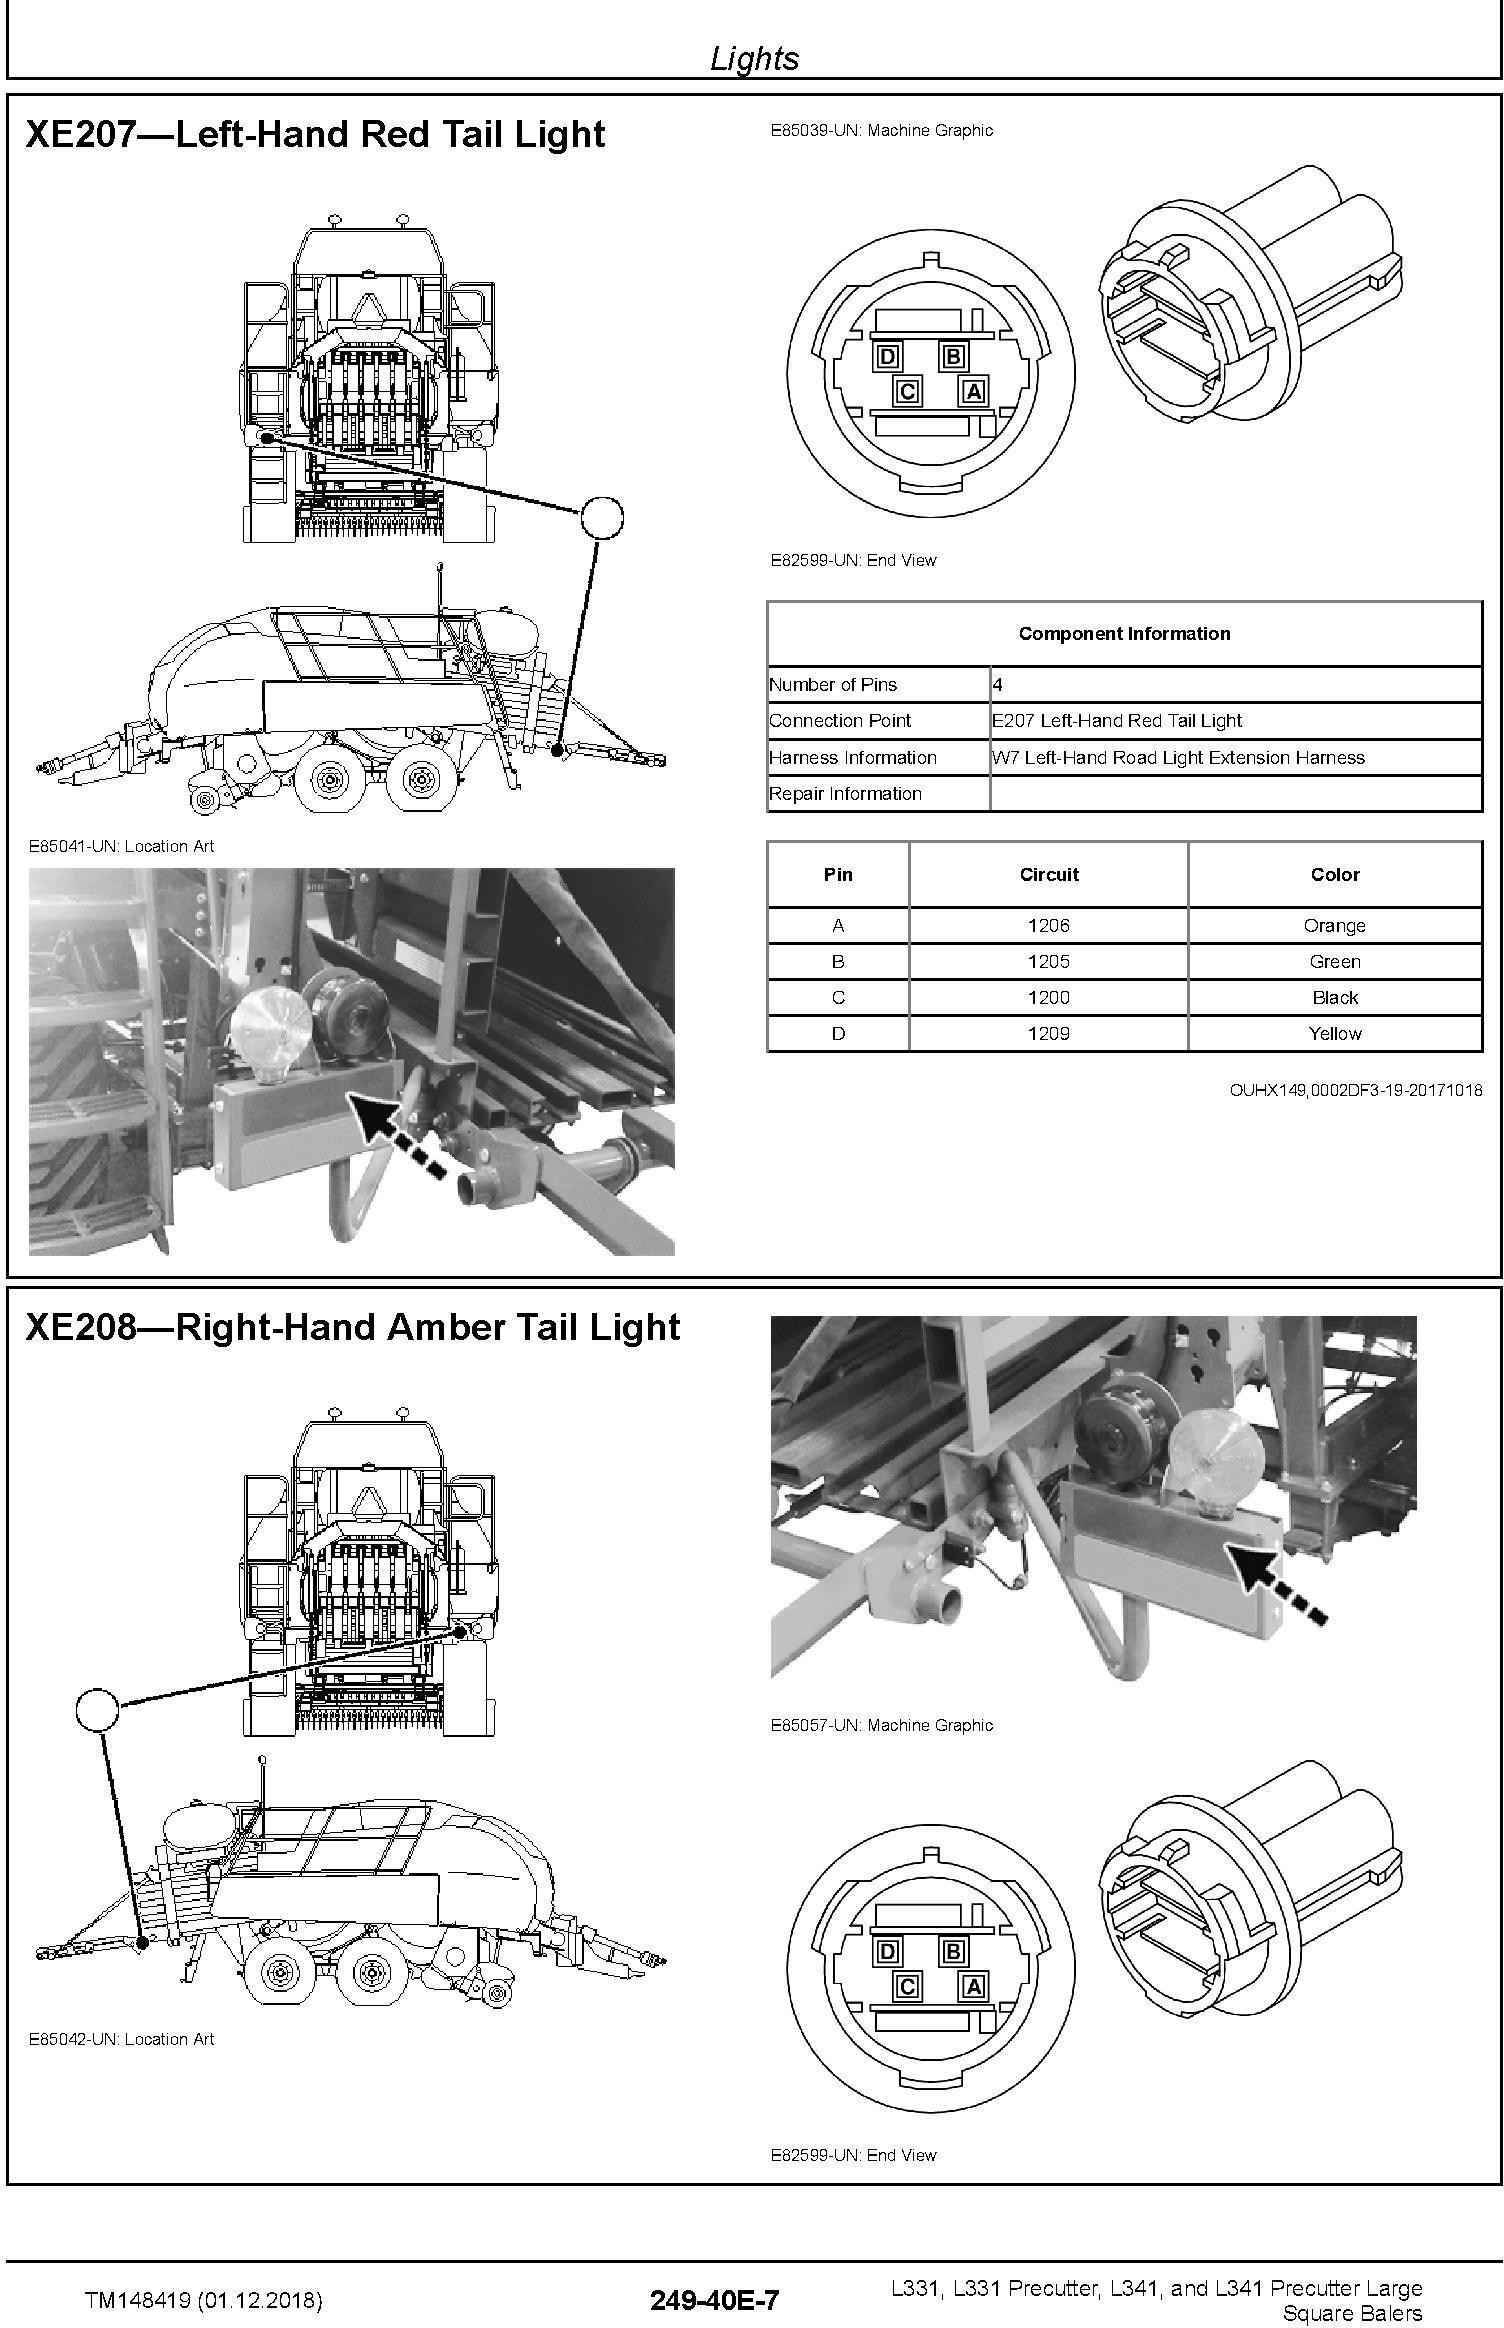 JD John Deere L331/Precutter, L341/ Precutter Large Square Balers Repair Technical Manual (TM148419) - 2